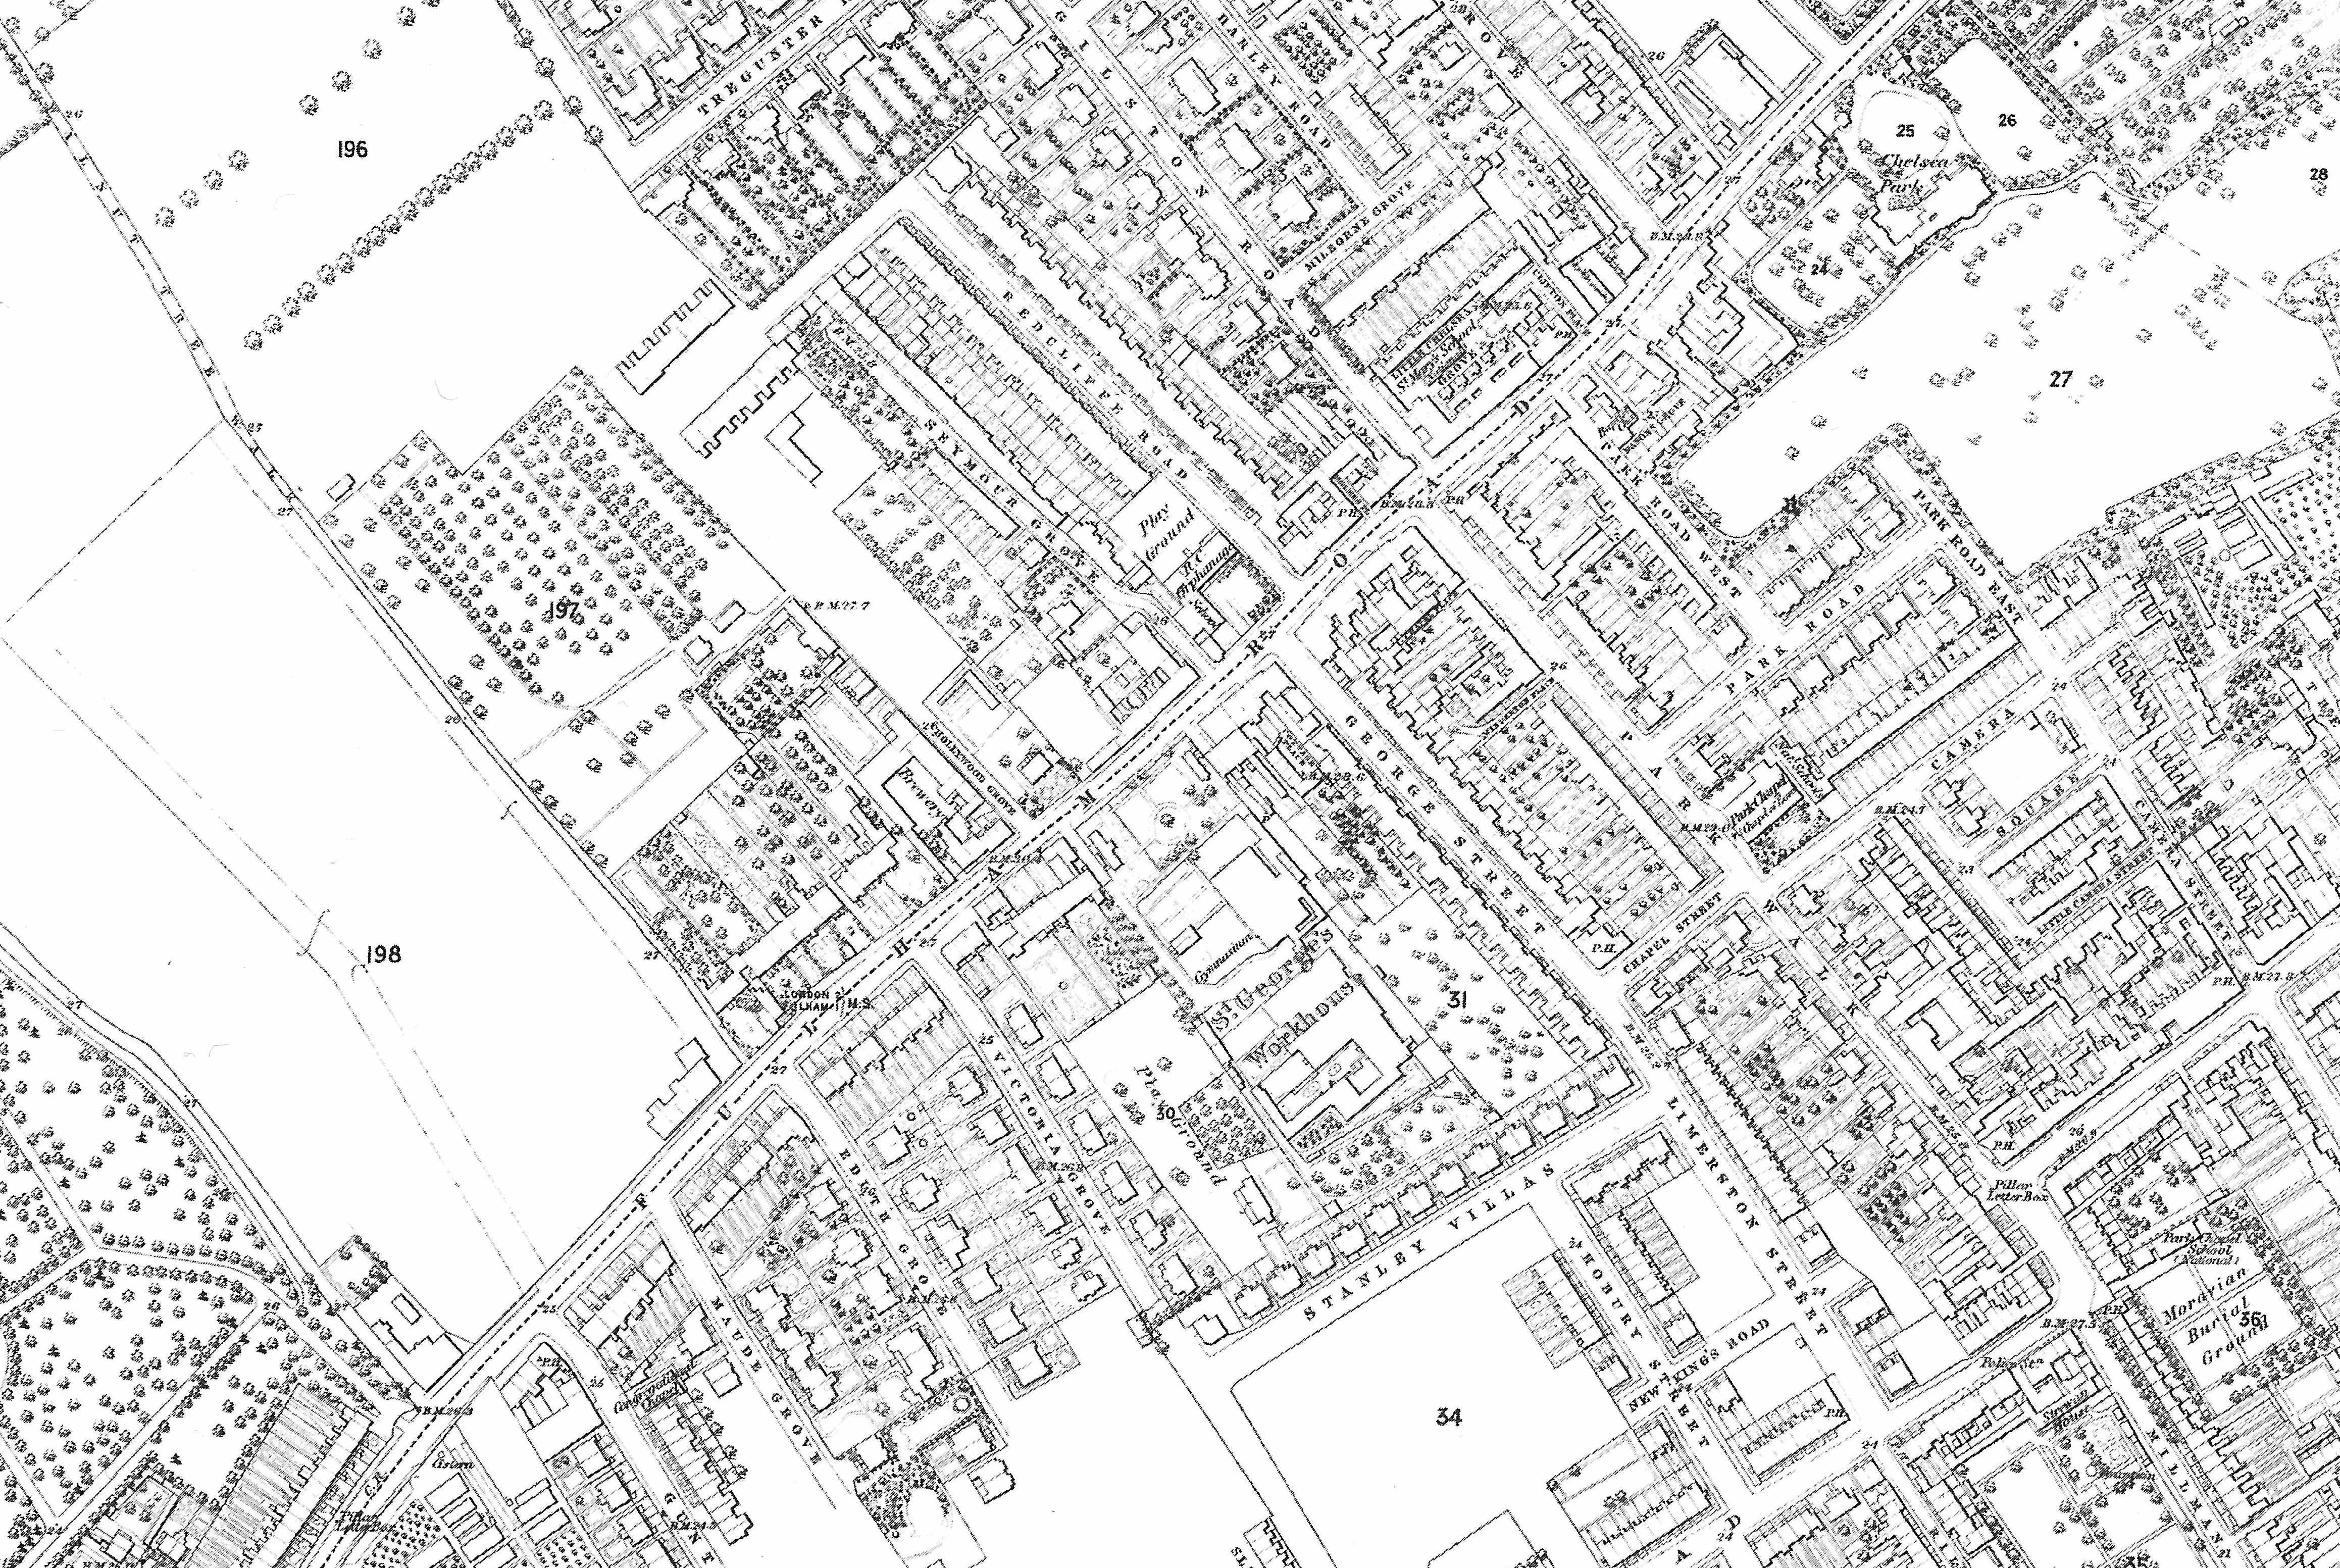 Os map 1865_600dpi_crop_Fulham Rd_lores